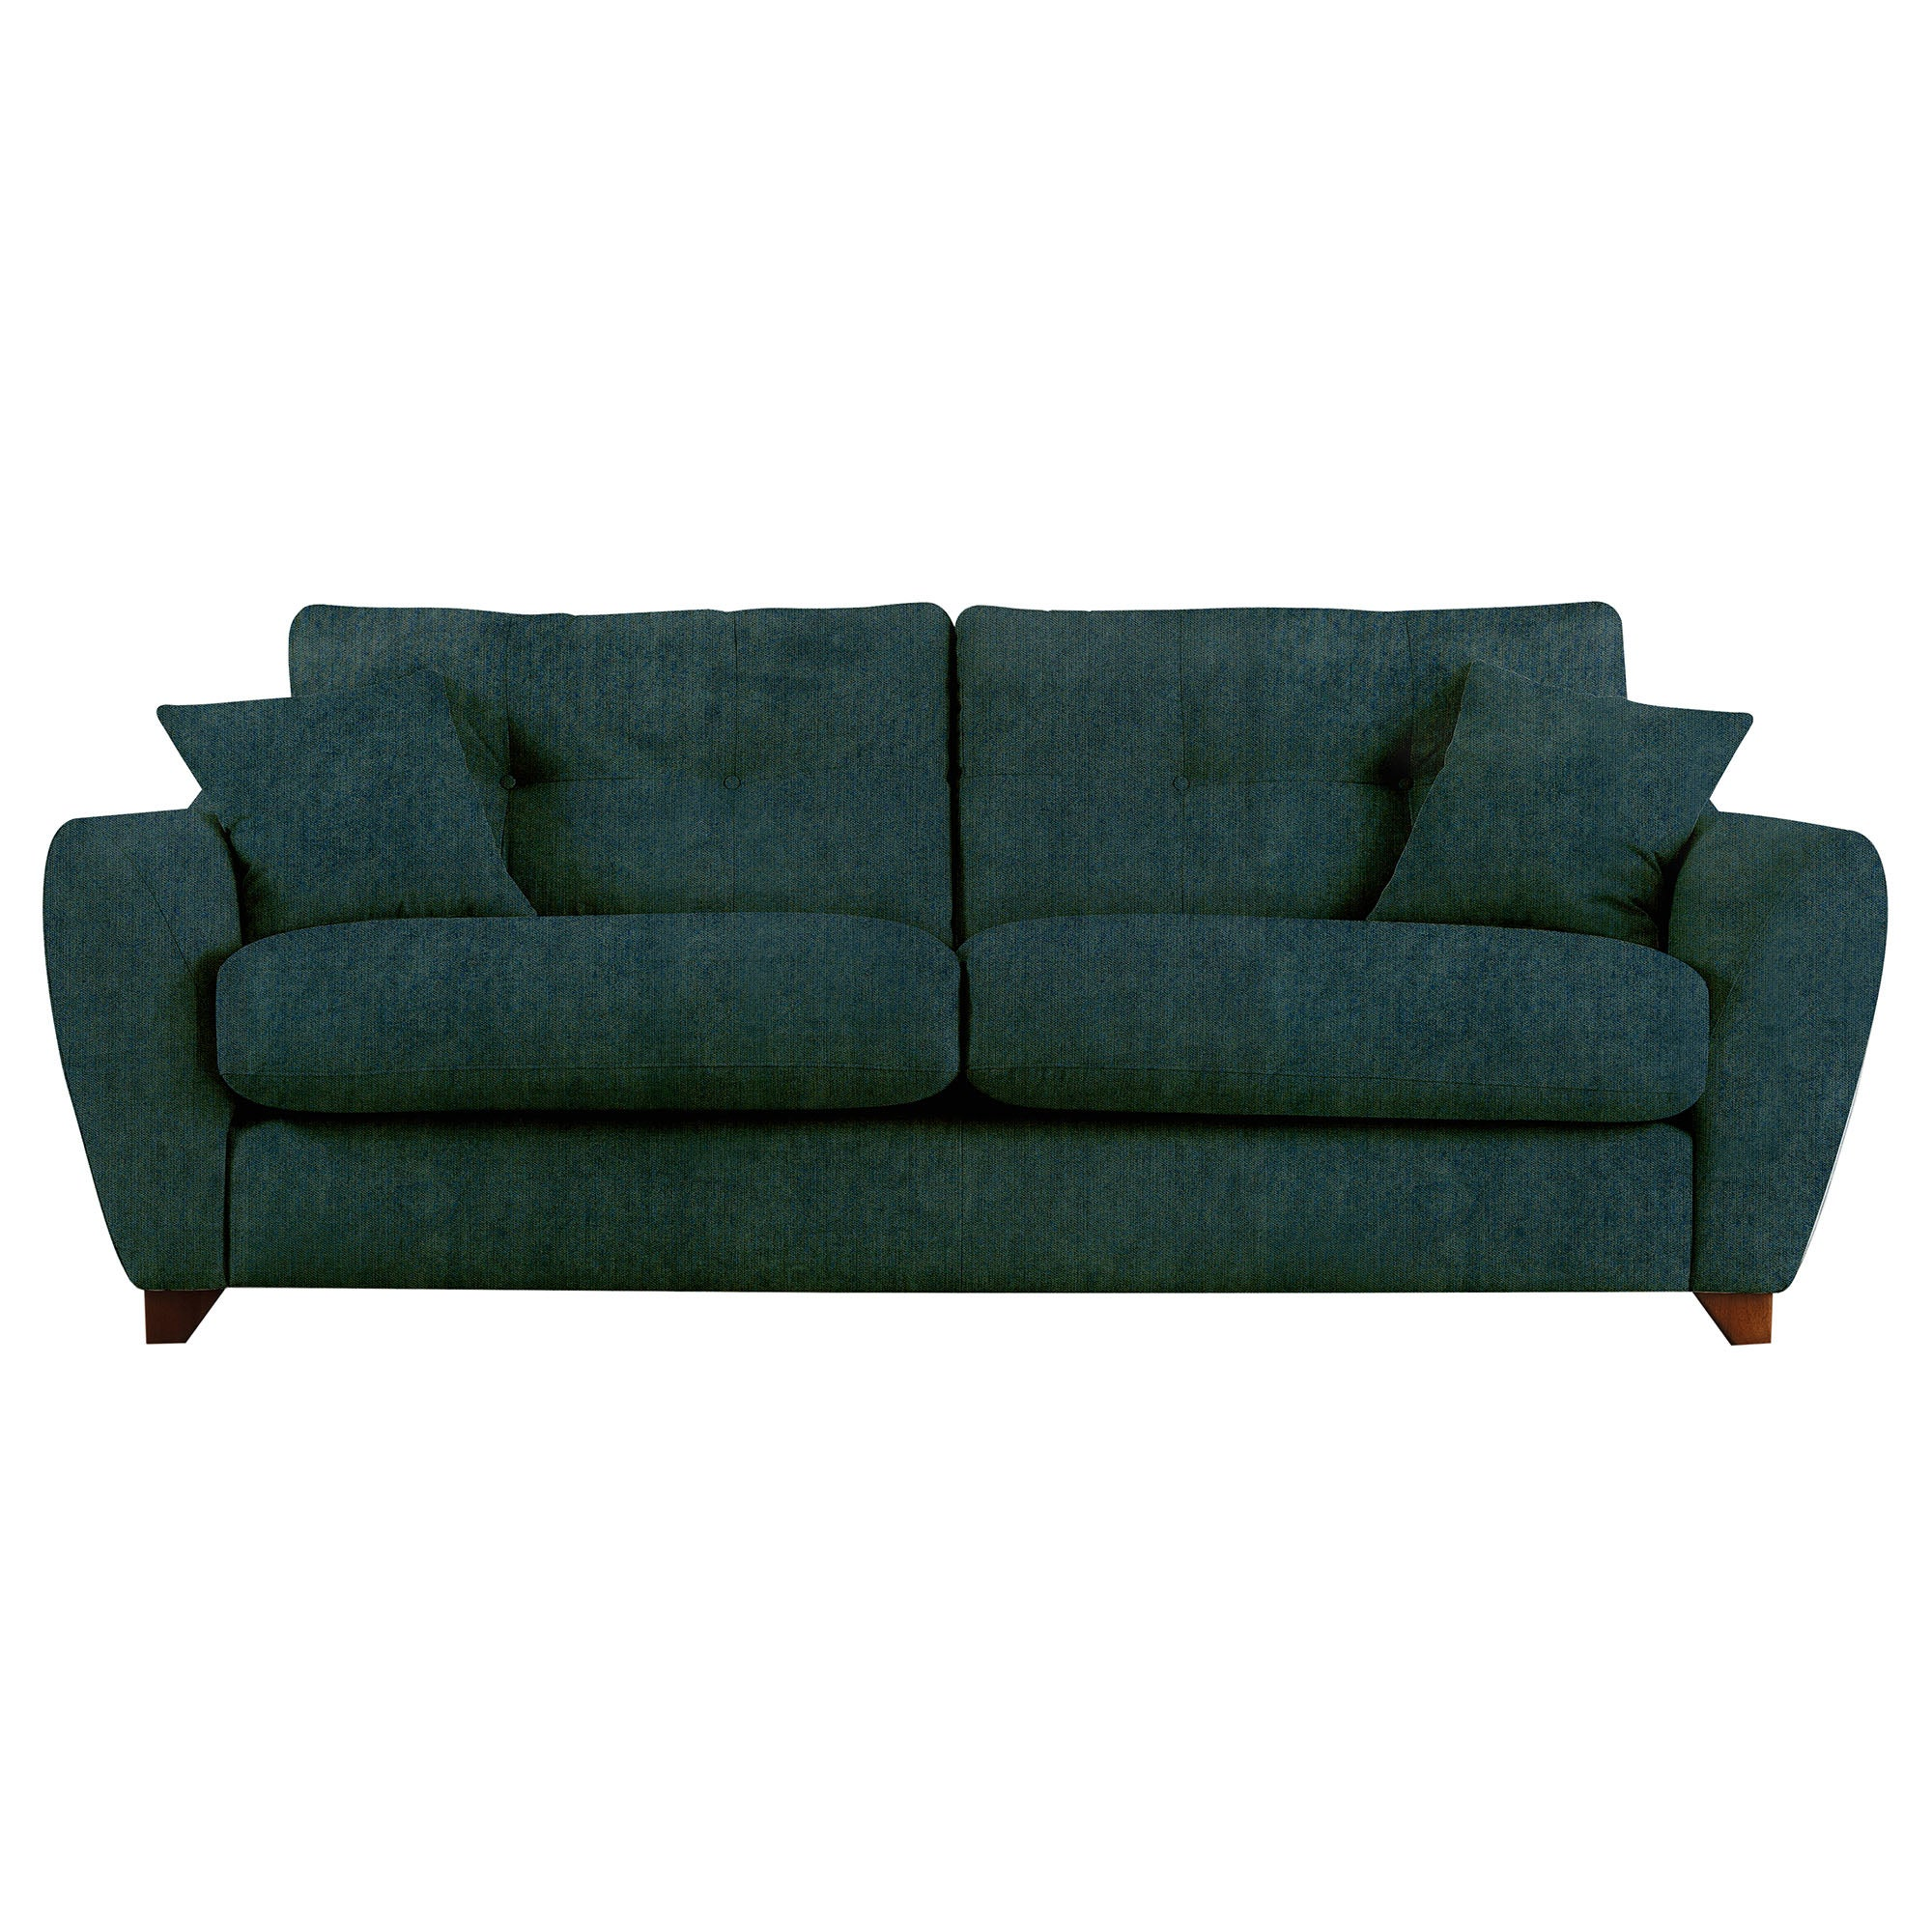 Gosport sofa dark green teal green for Dark green sectional sofa